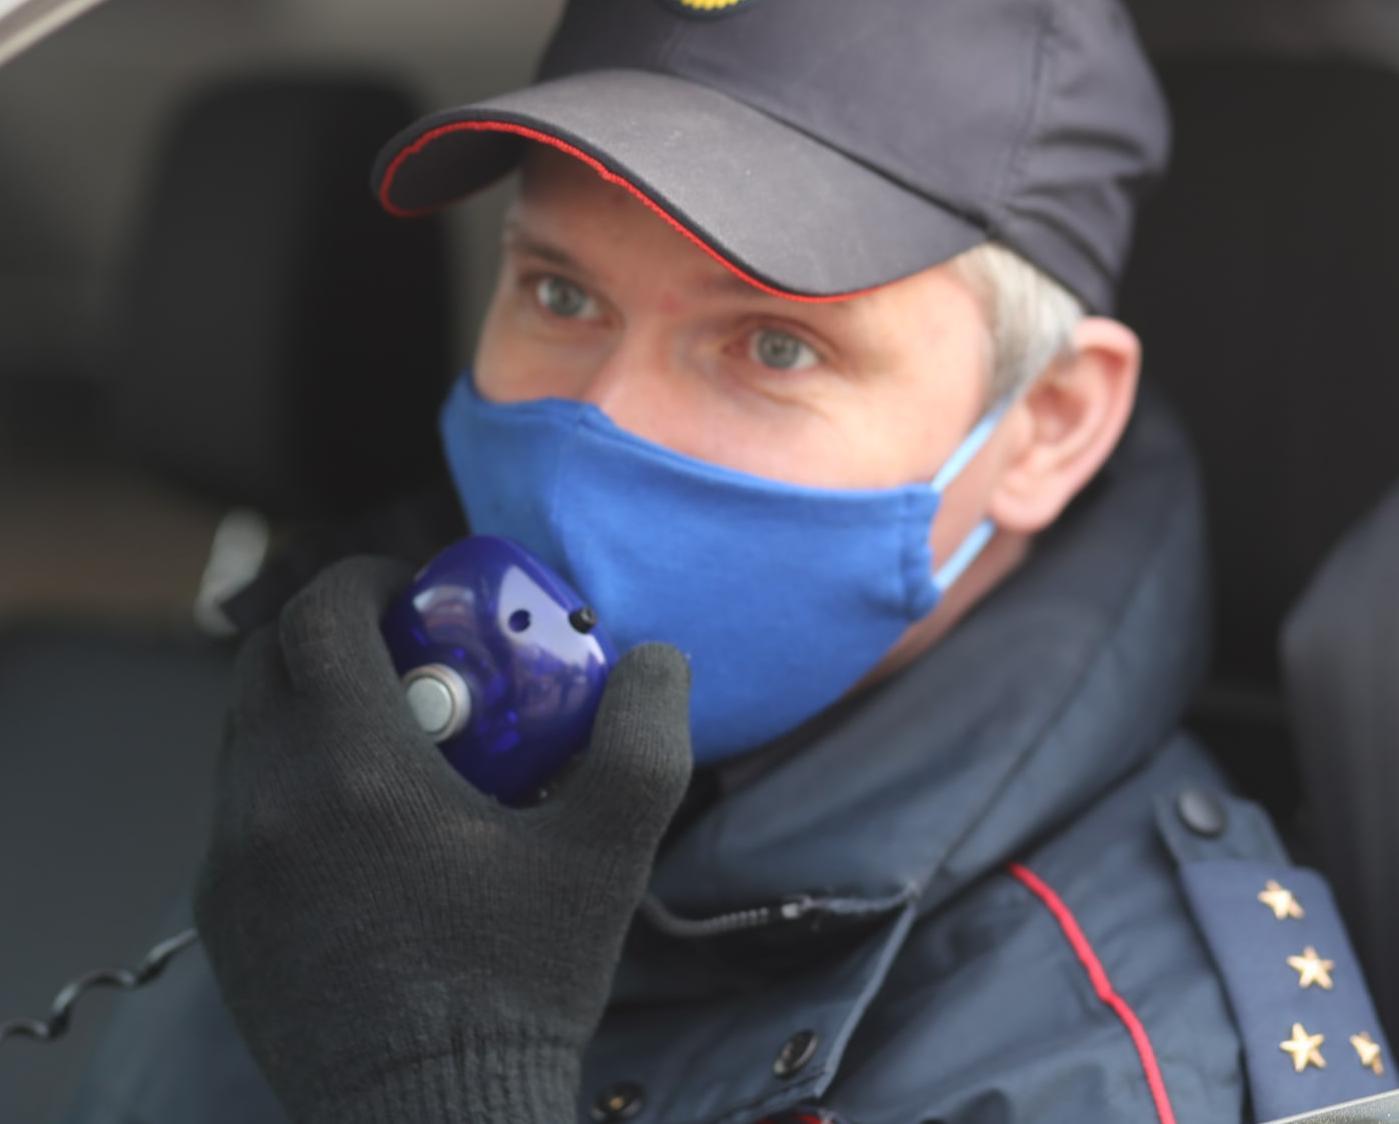 В Кирово-Чепецком районе три наряда ГИБДД с оружием ловили гонщика-нарушителя ПДД